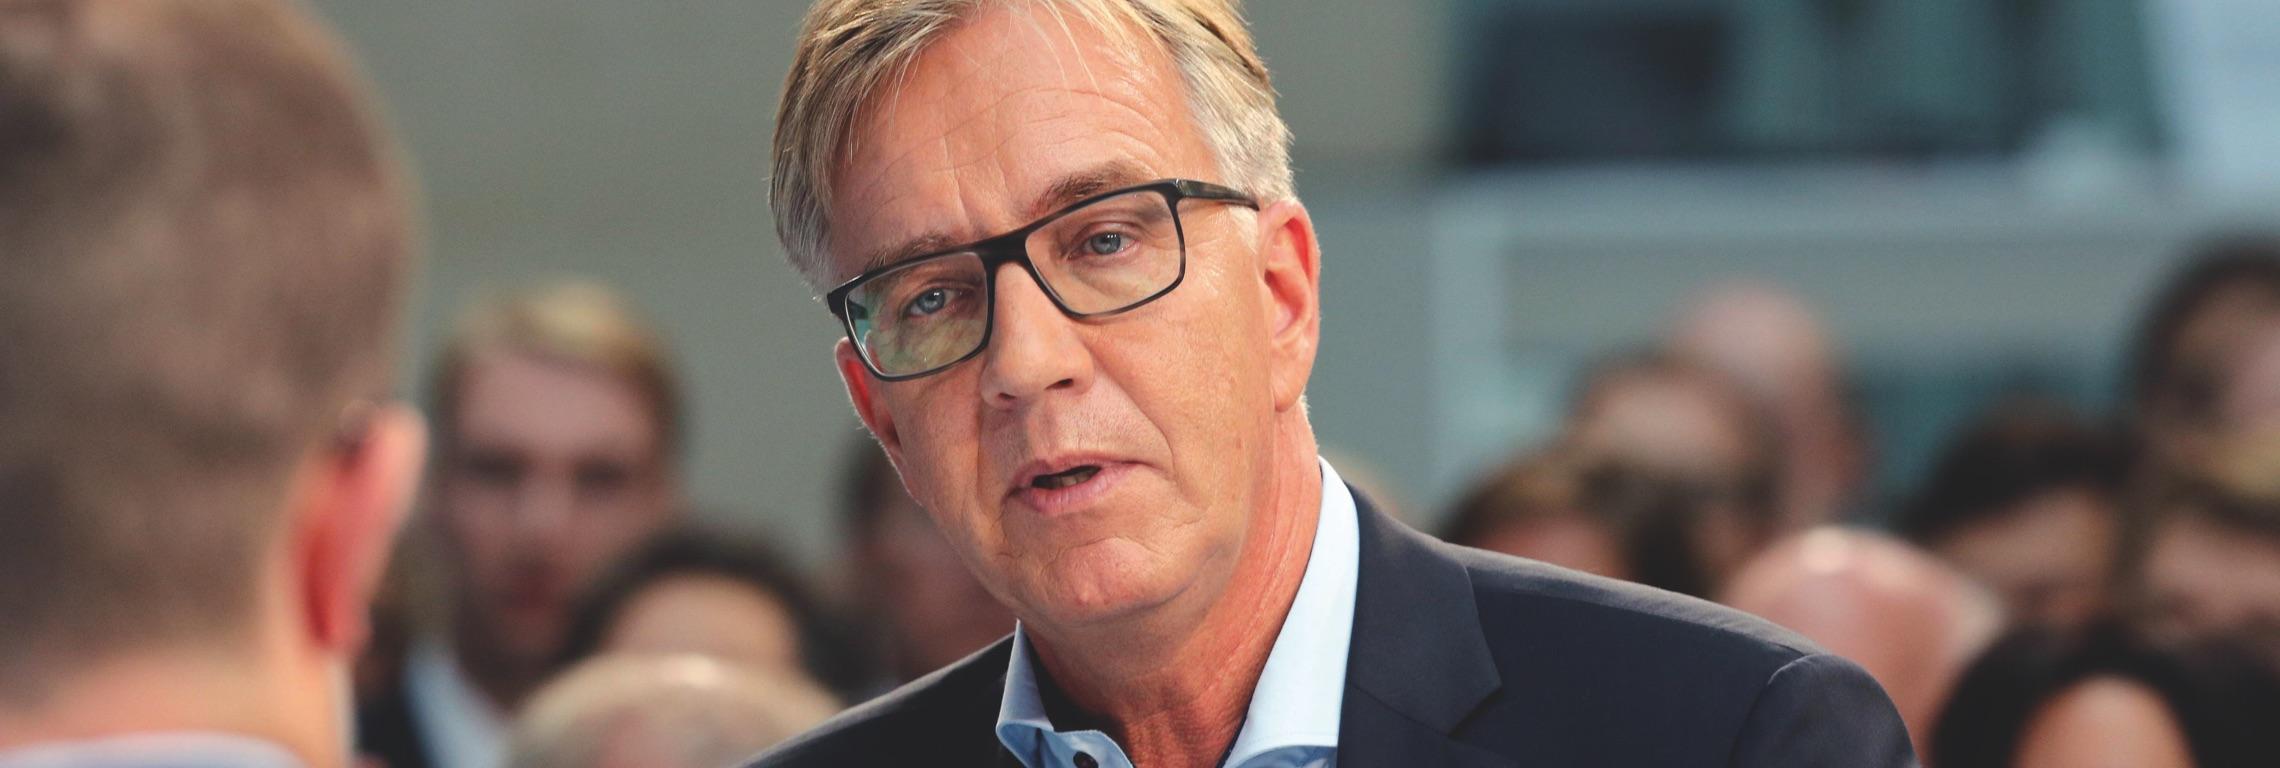 Dietmar Bartsch, Bild: Linksfraktion.de